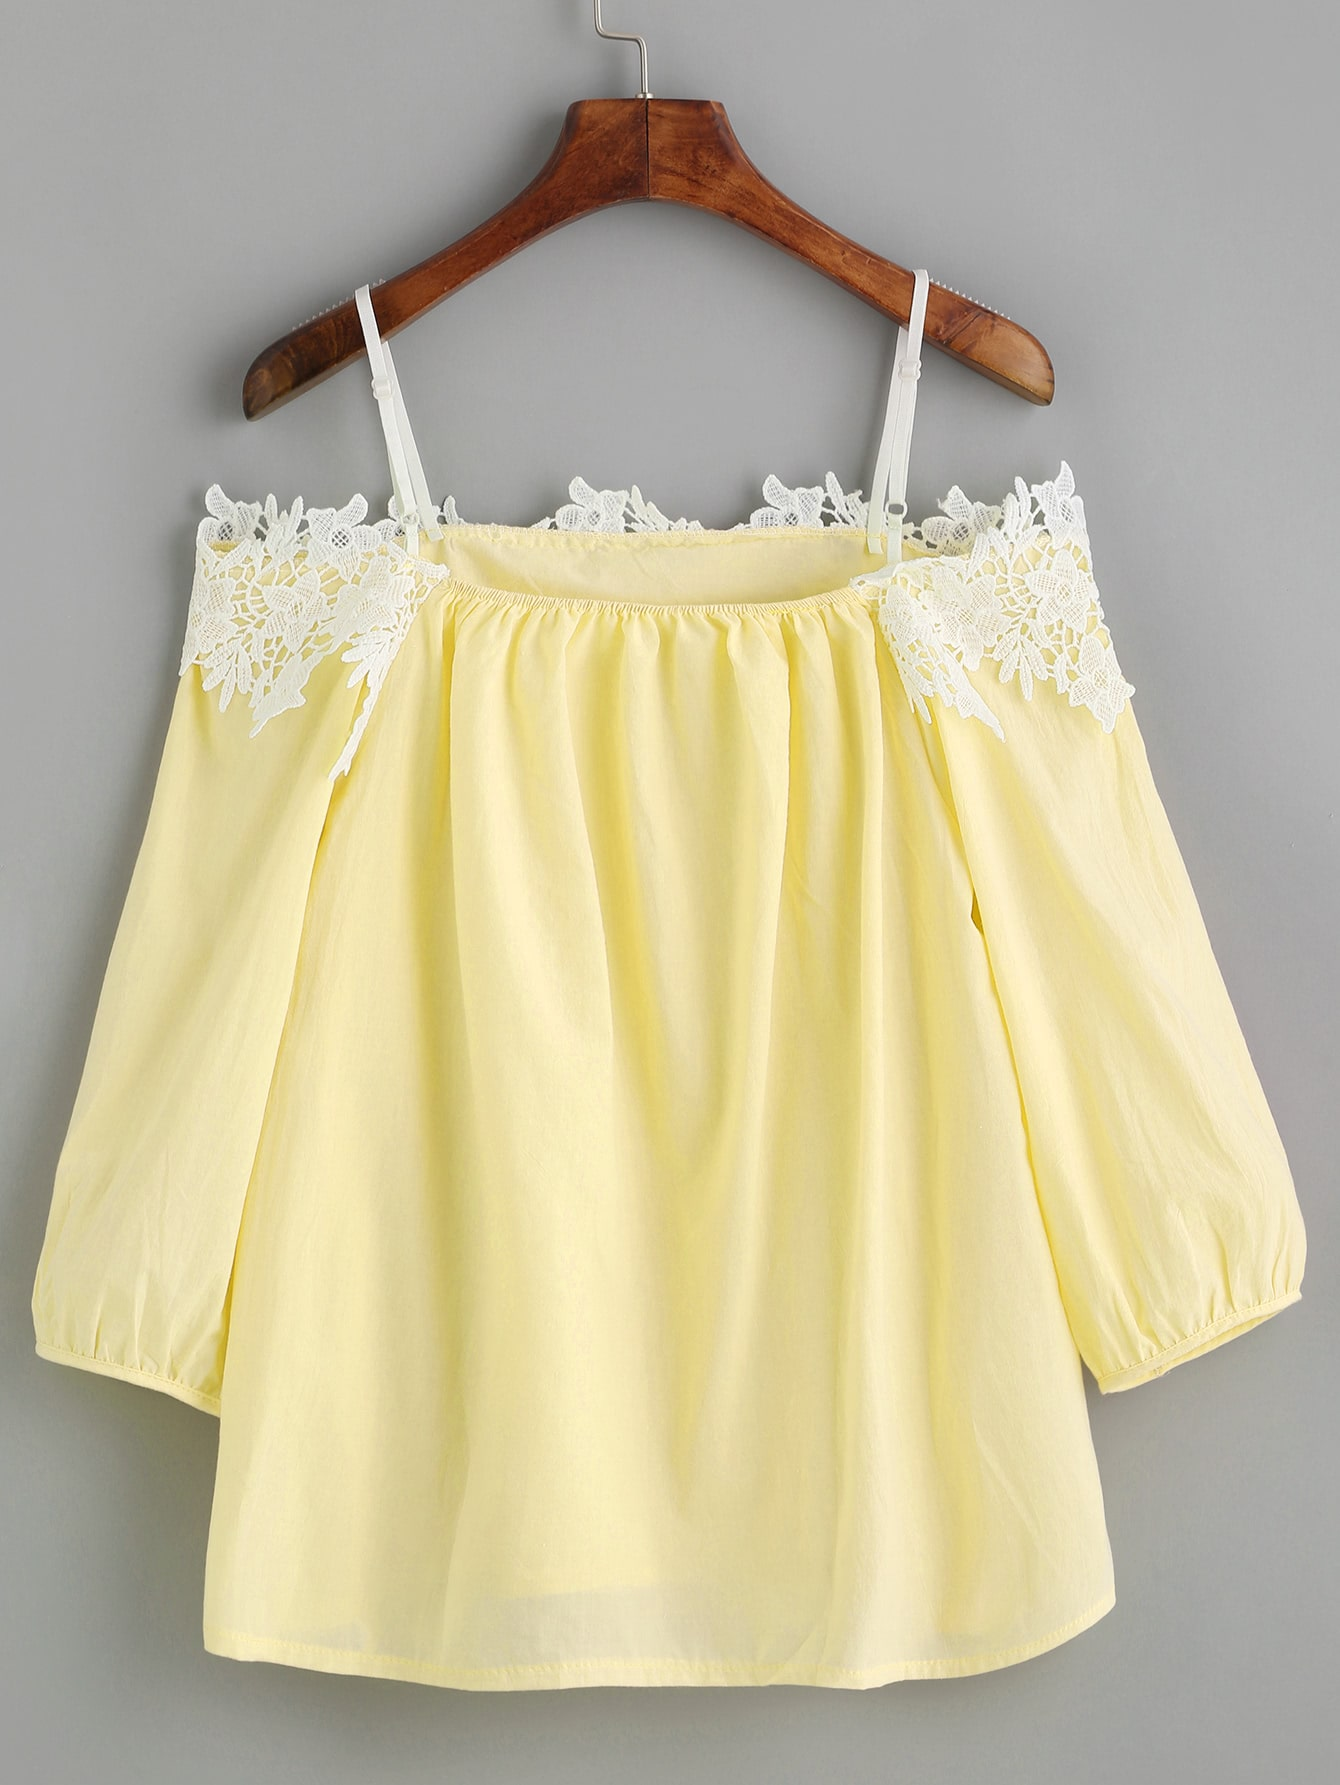 blouse170222103_2